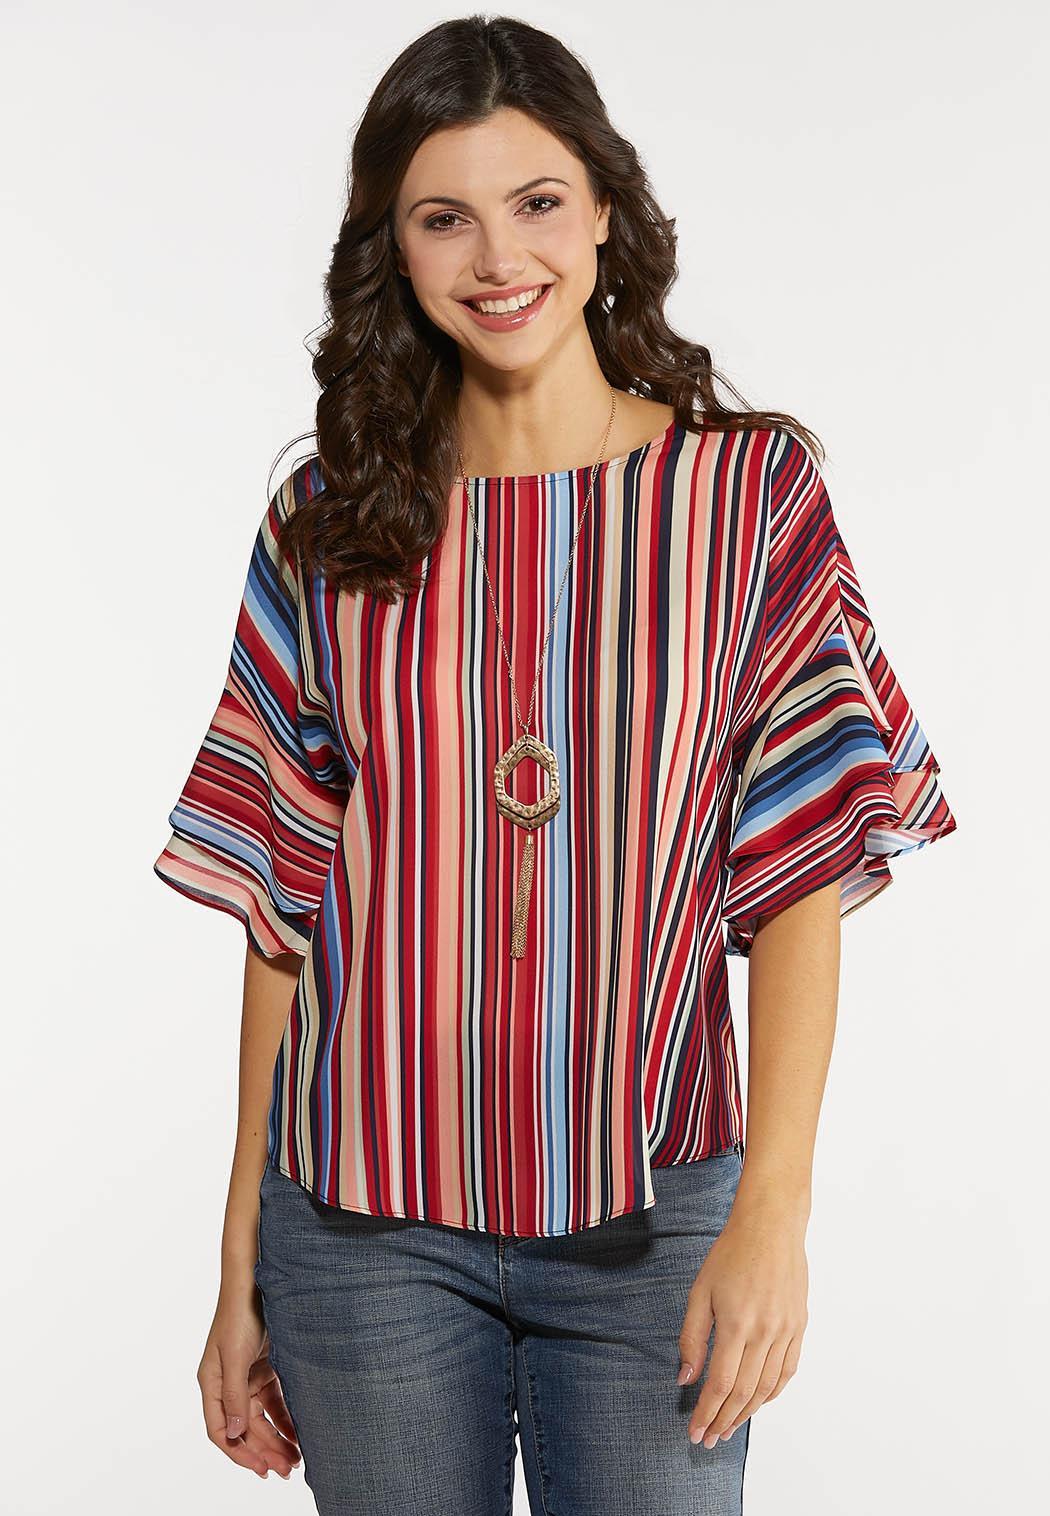 Double Ruffle Stripe Top